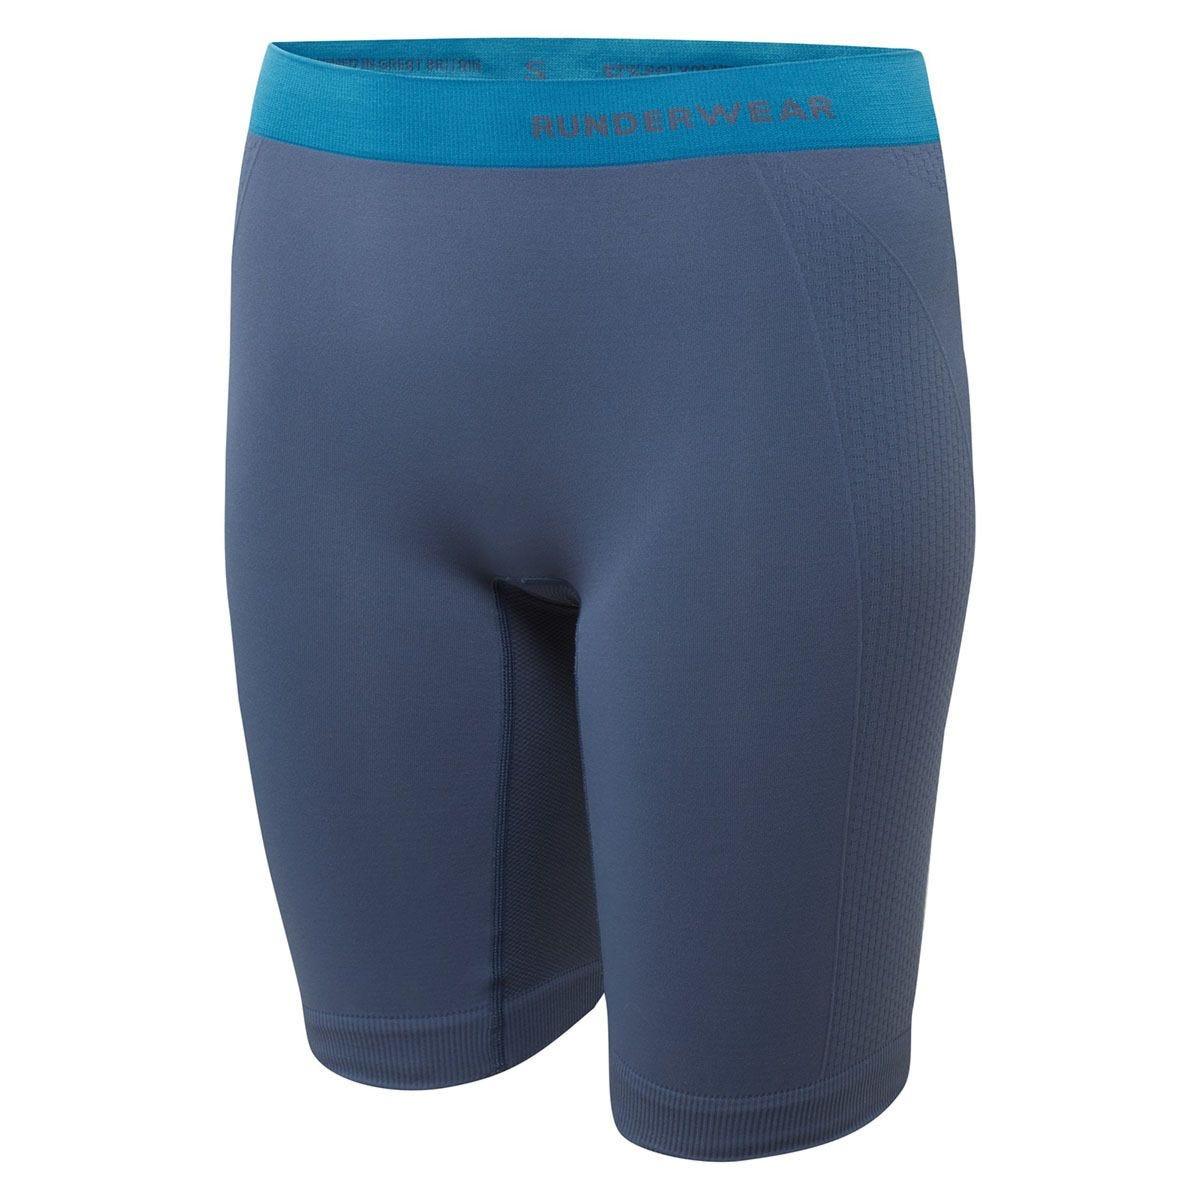 Runderwear Women's Long Shorts - Chafe-Free Medium - Blue